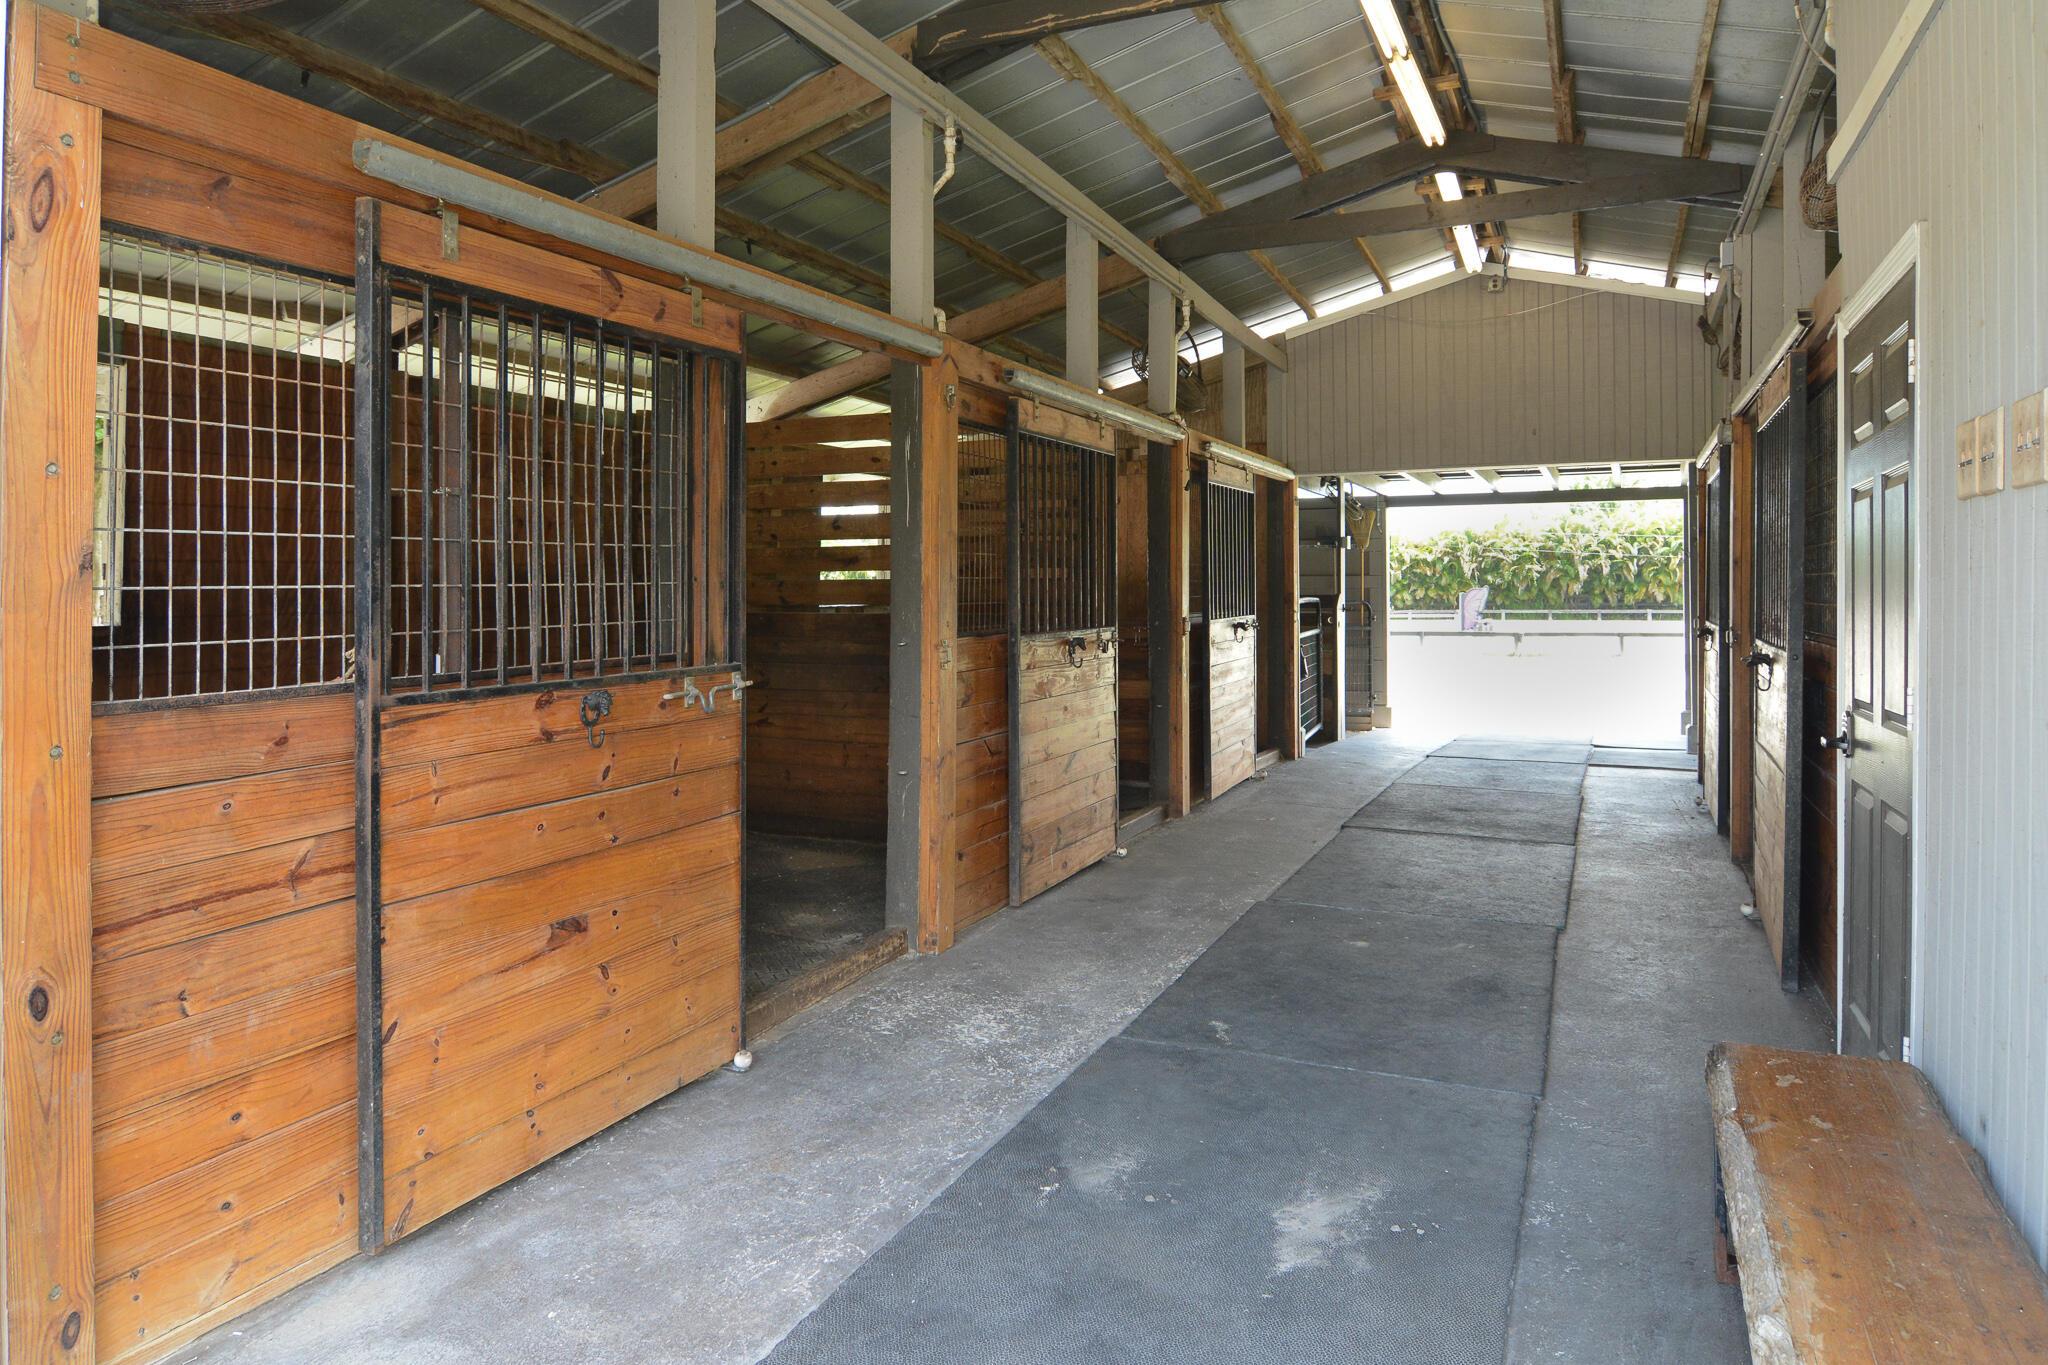 5 Stalls